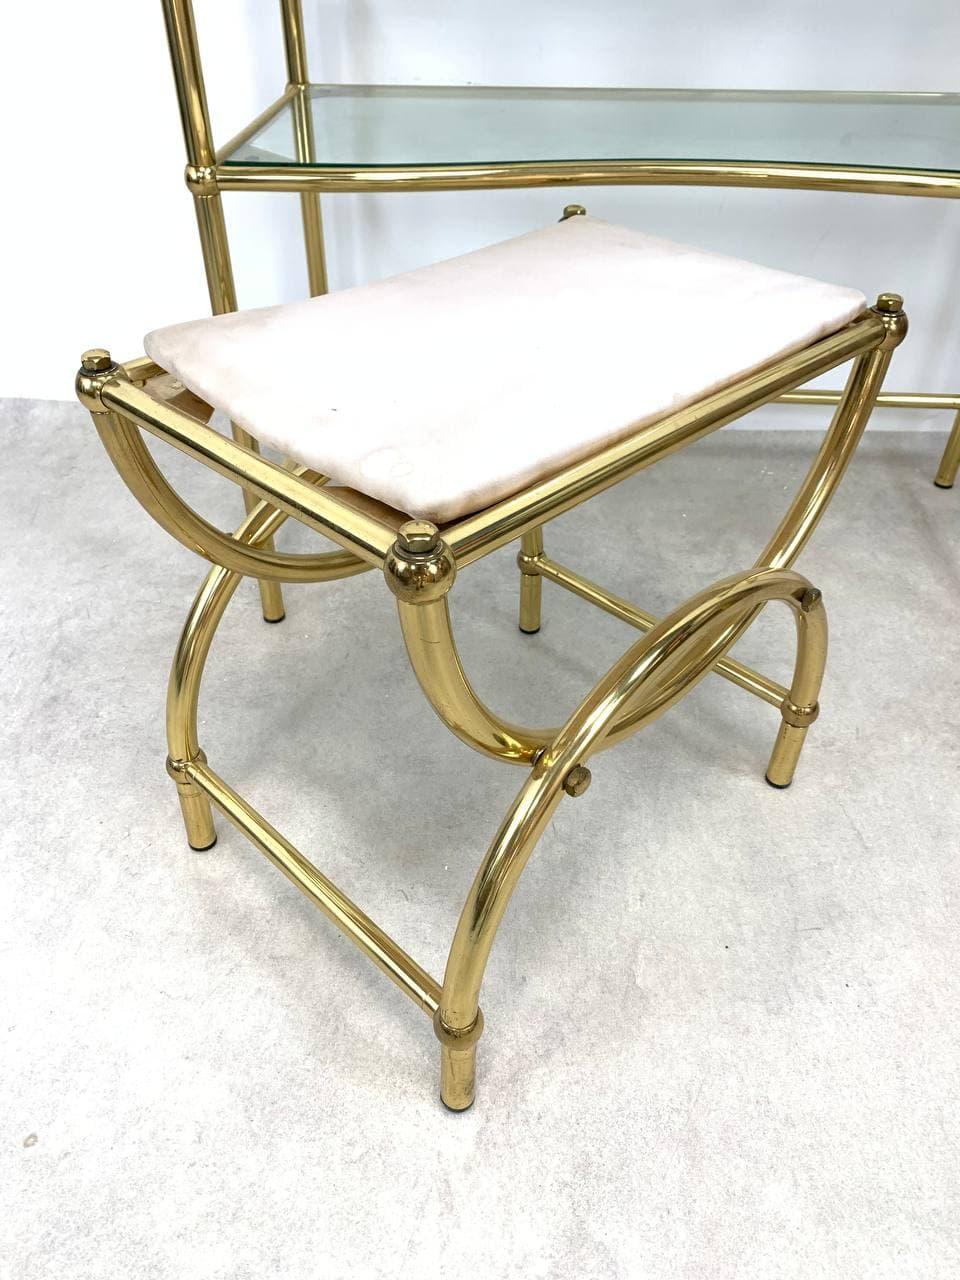 Винтажный дамский столик с табуретом из латуни